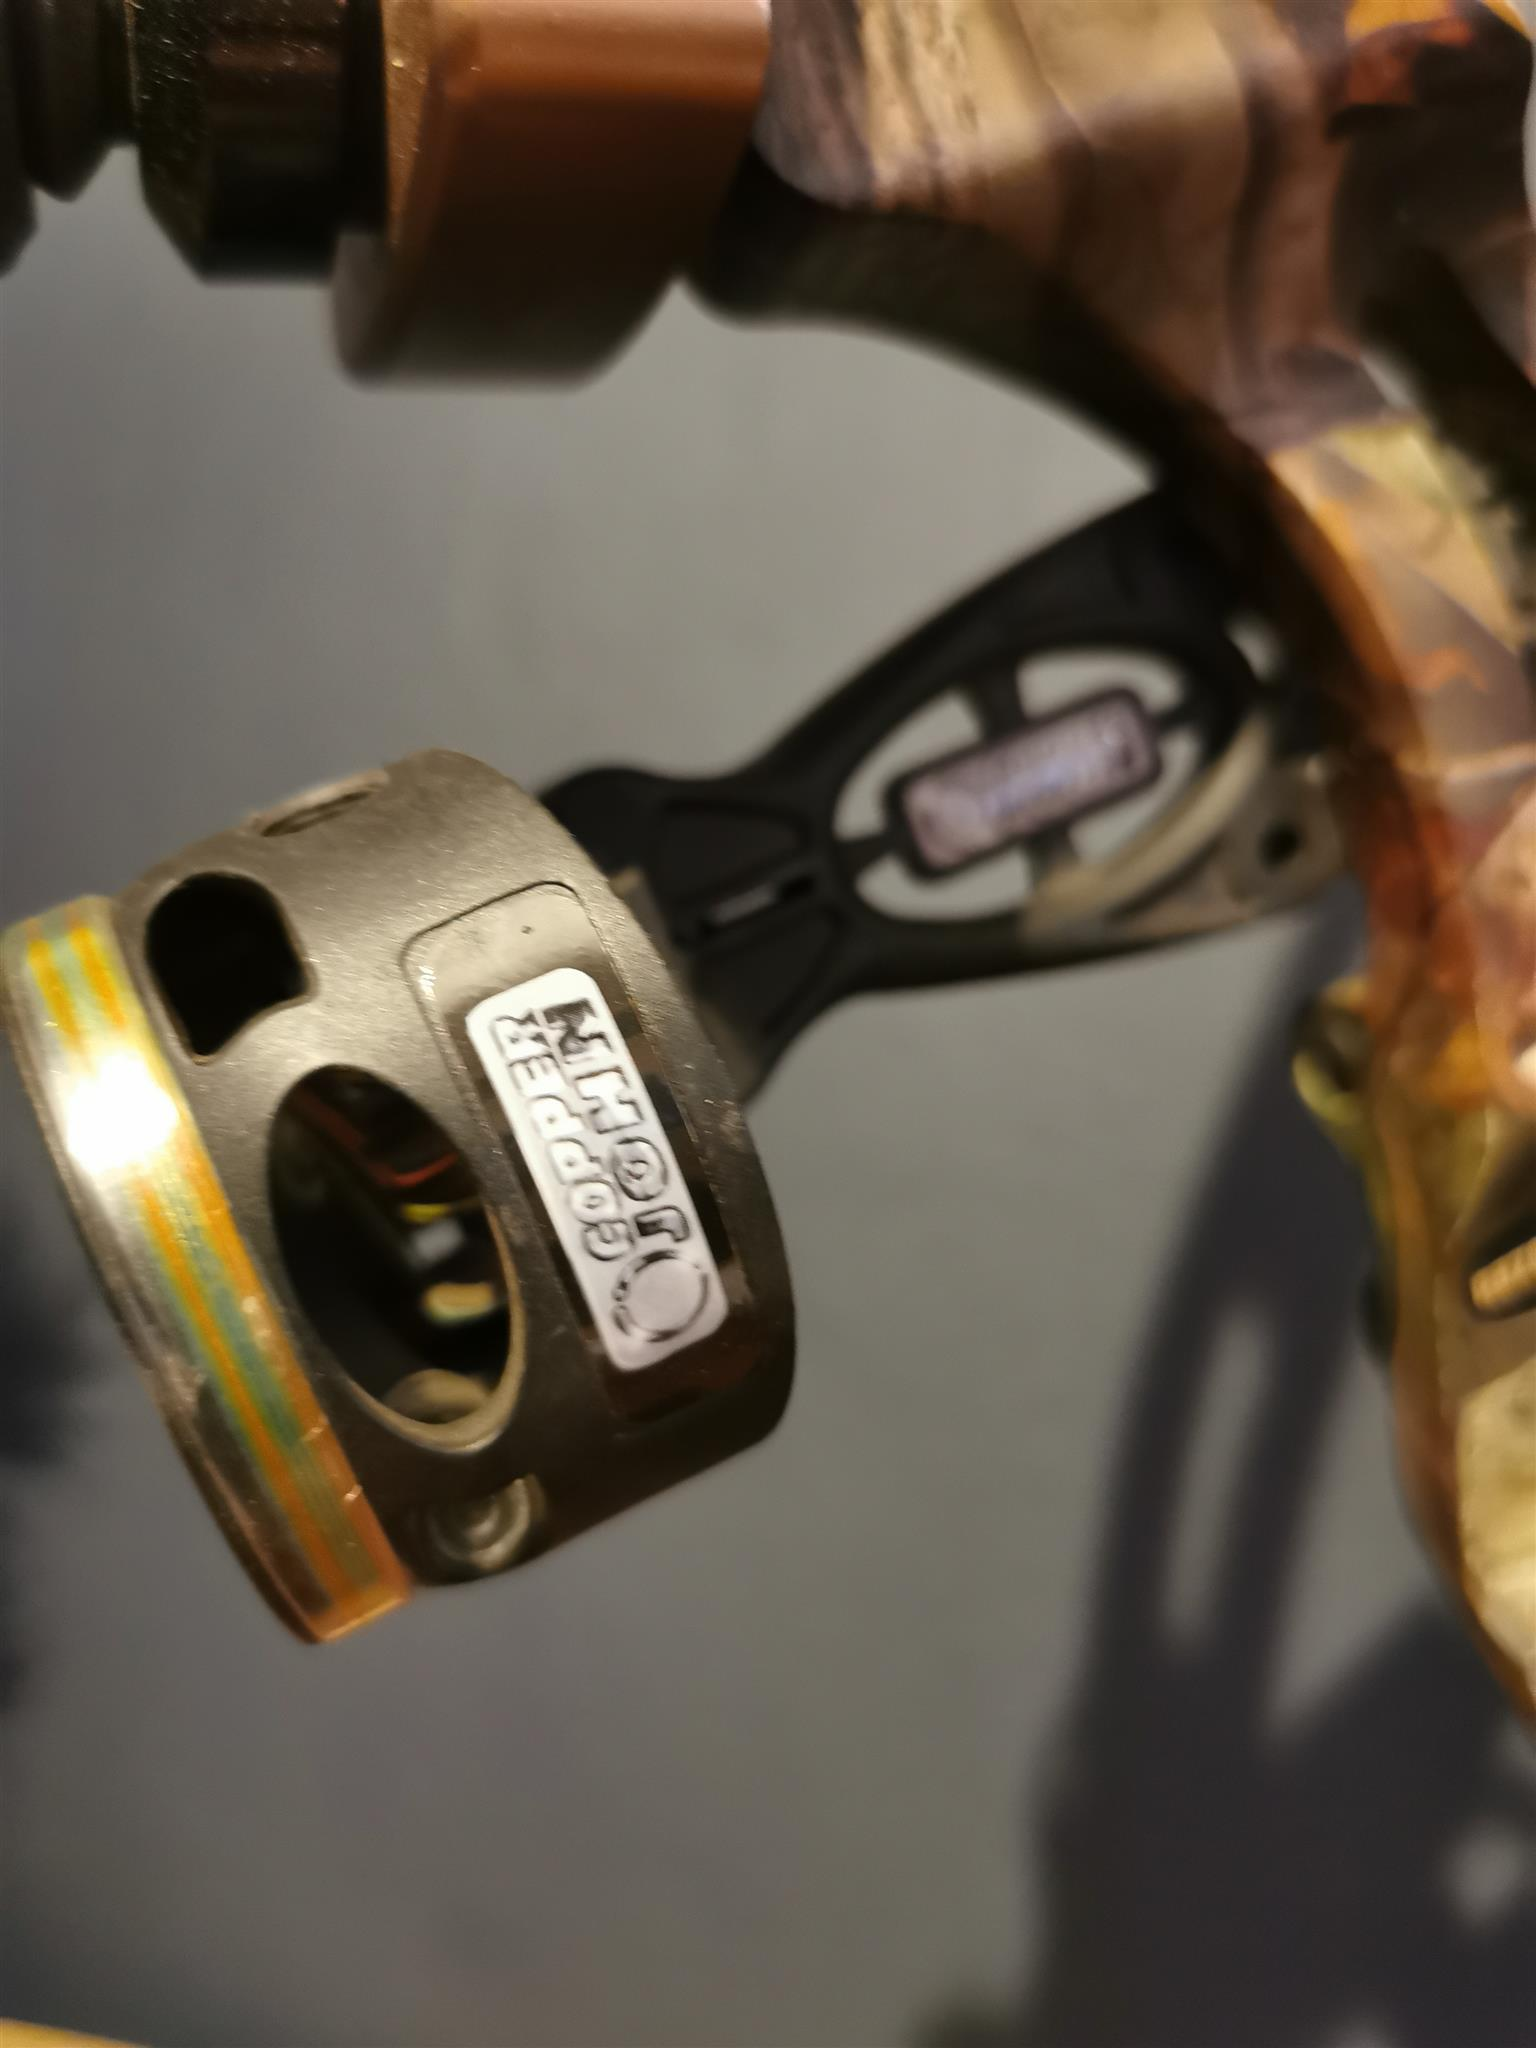 Hoyt Razor Tec Xt2000 Copper John 5 Pin Sight 27.5 - 30 Brand new strings R3000